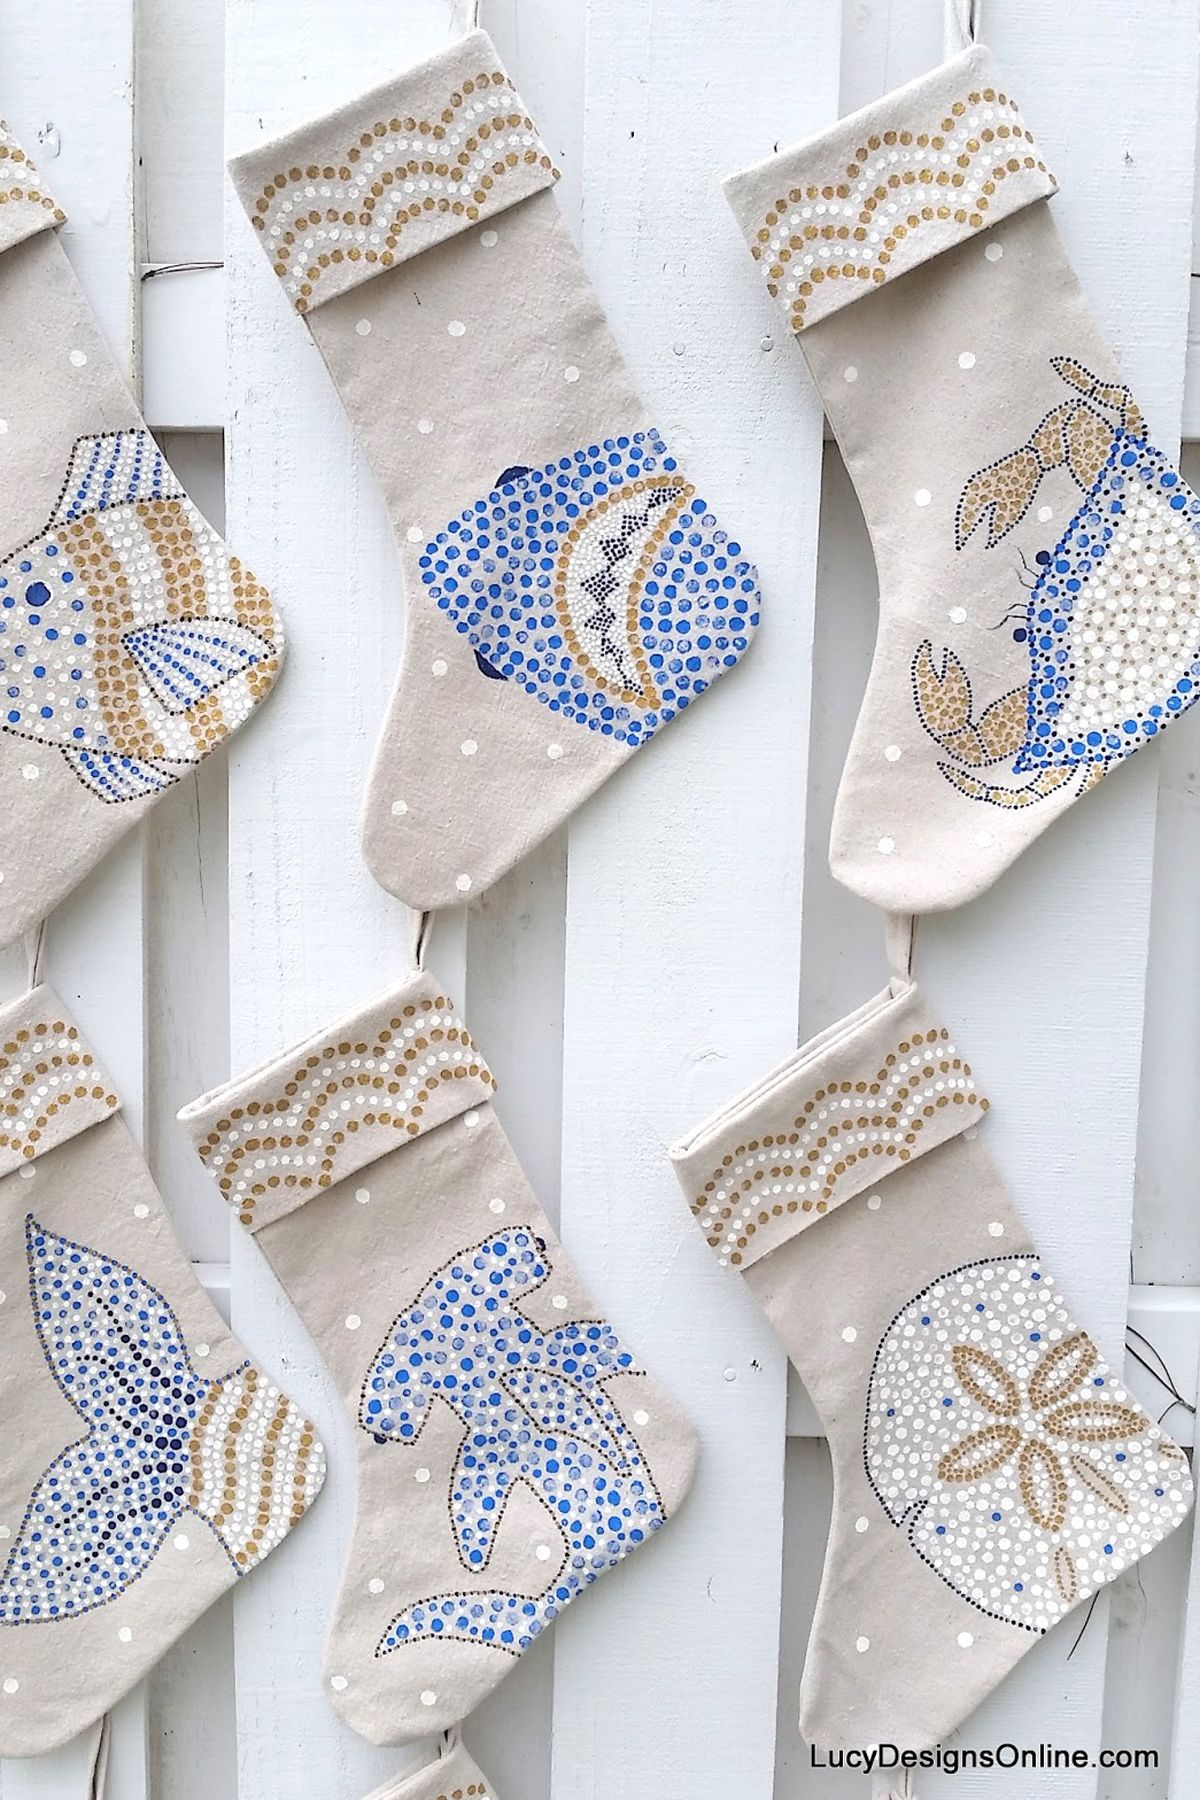 23 DIY Christmas Stockings - How to Make Christmas Stockings Craft ...